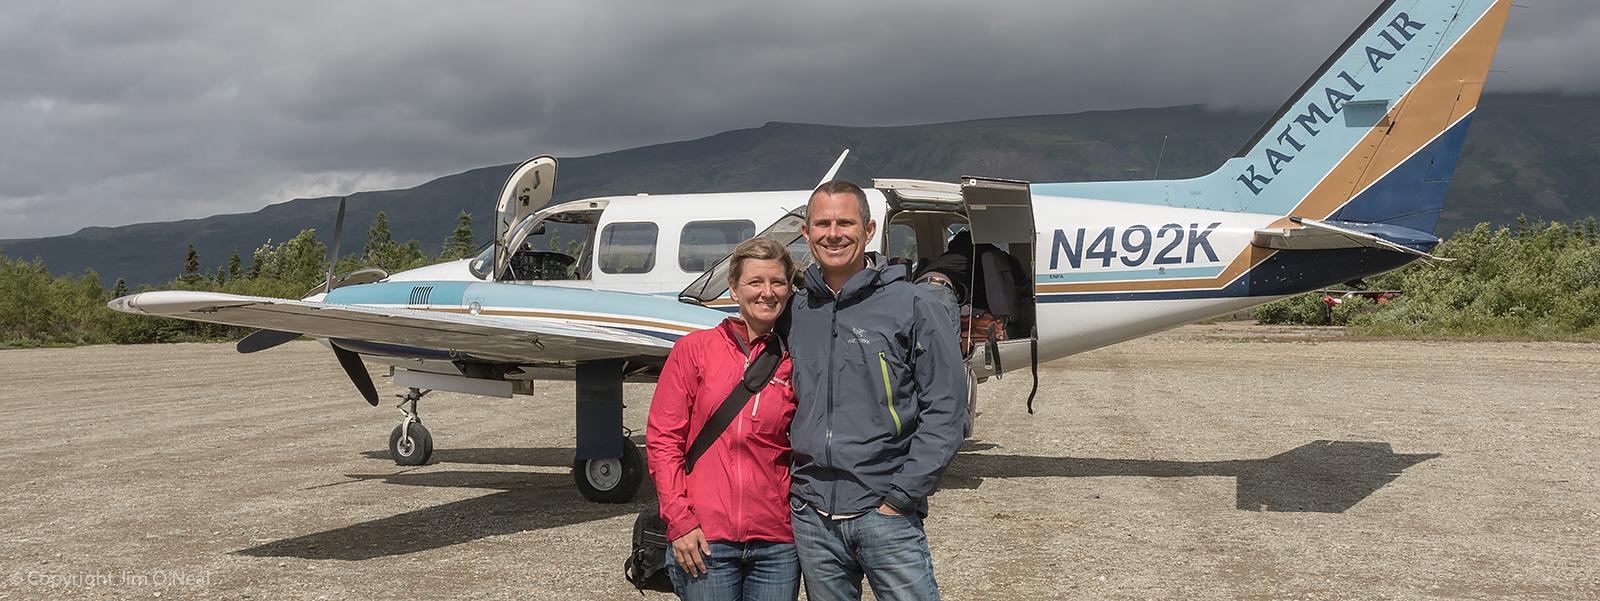 Boarding a Bush Plane to Katmai, Alaska